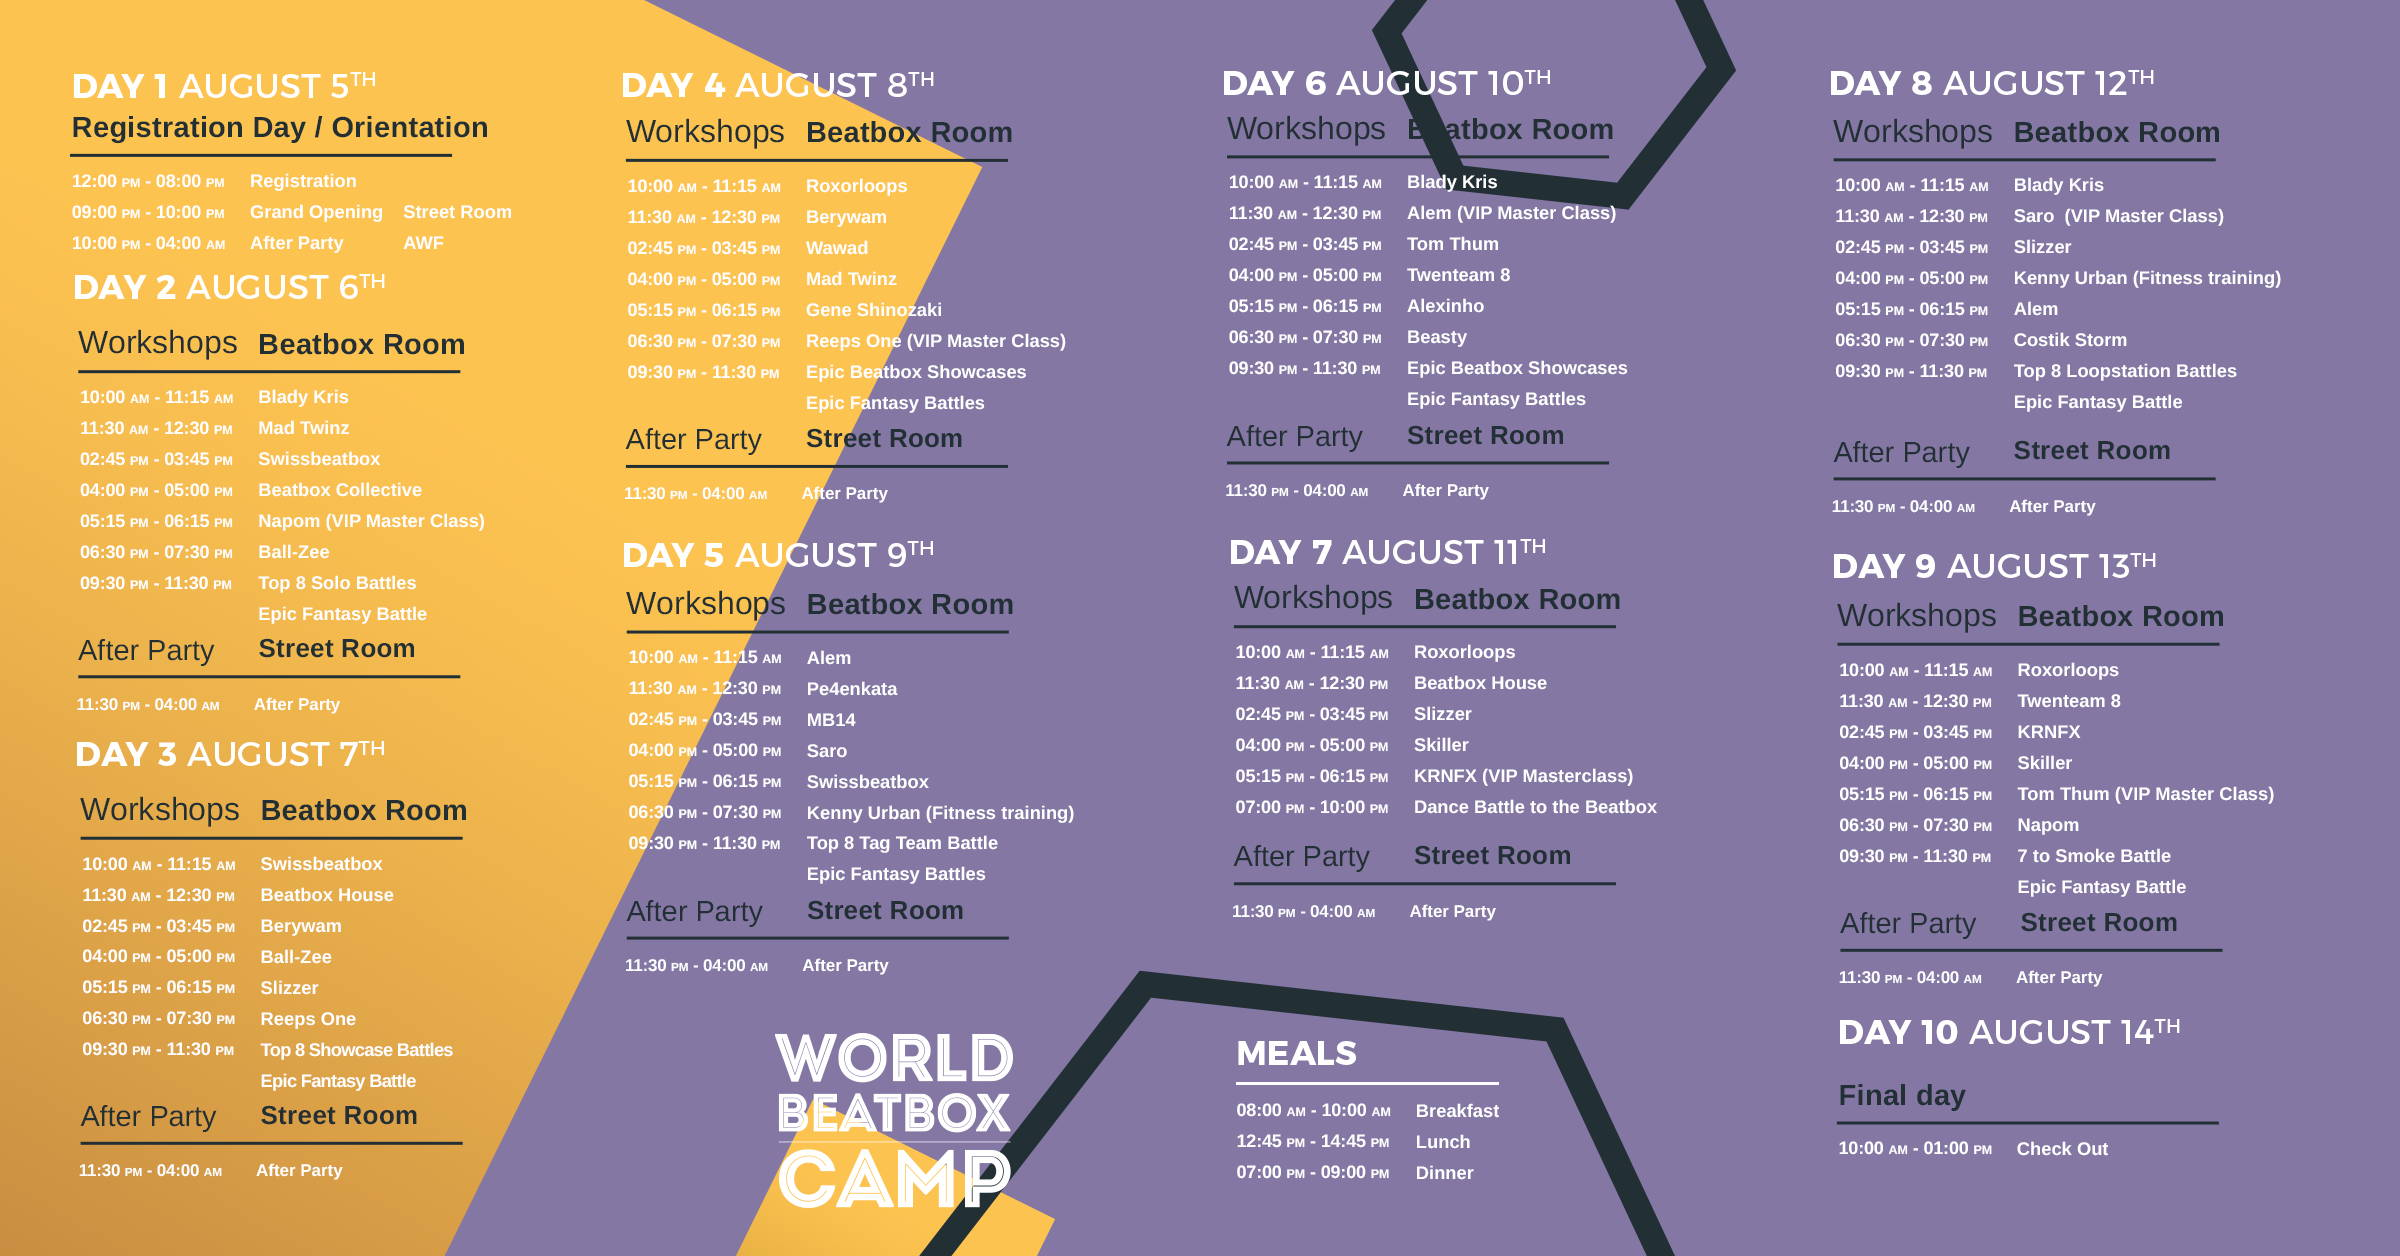 Dear Vips Worldbeatboxcamp